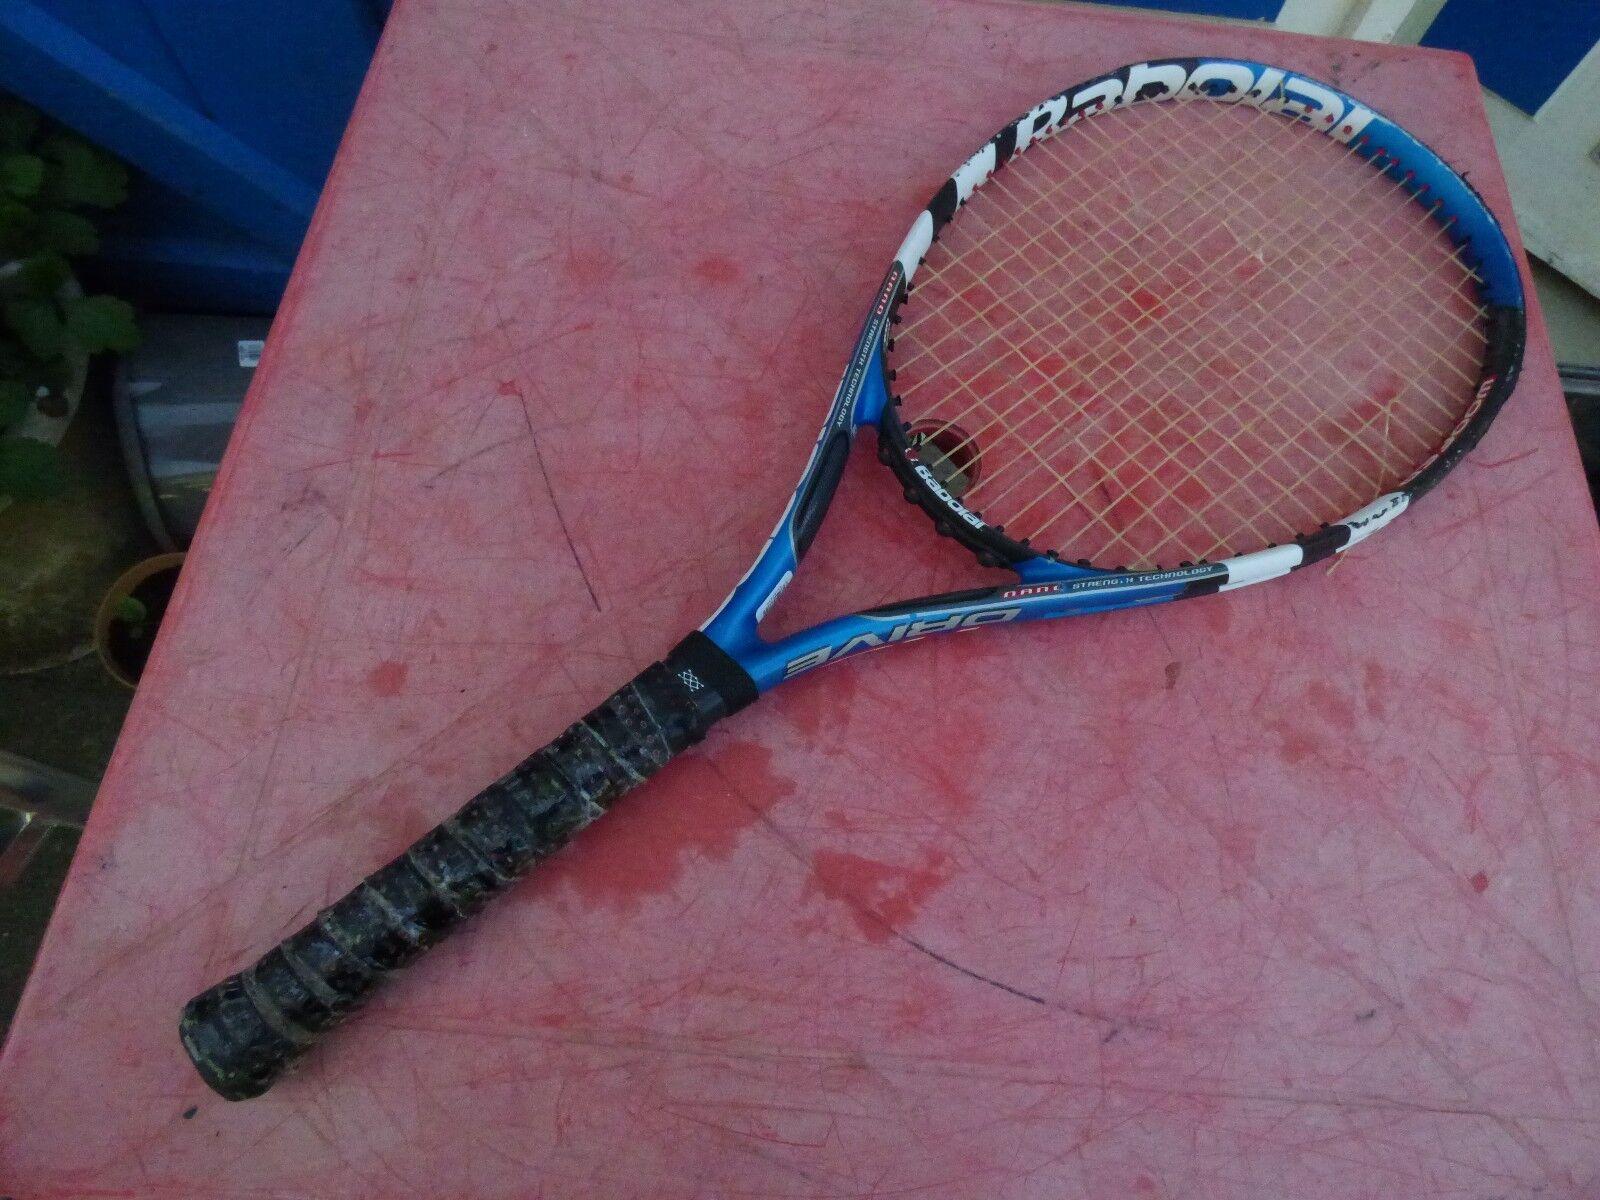 Tennisschläger Tennisschläger Tennisschläger Babolat NS Drive 1 4 1 8 bdbbdc